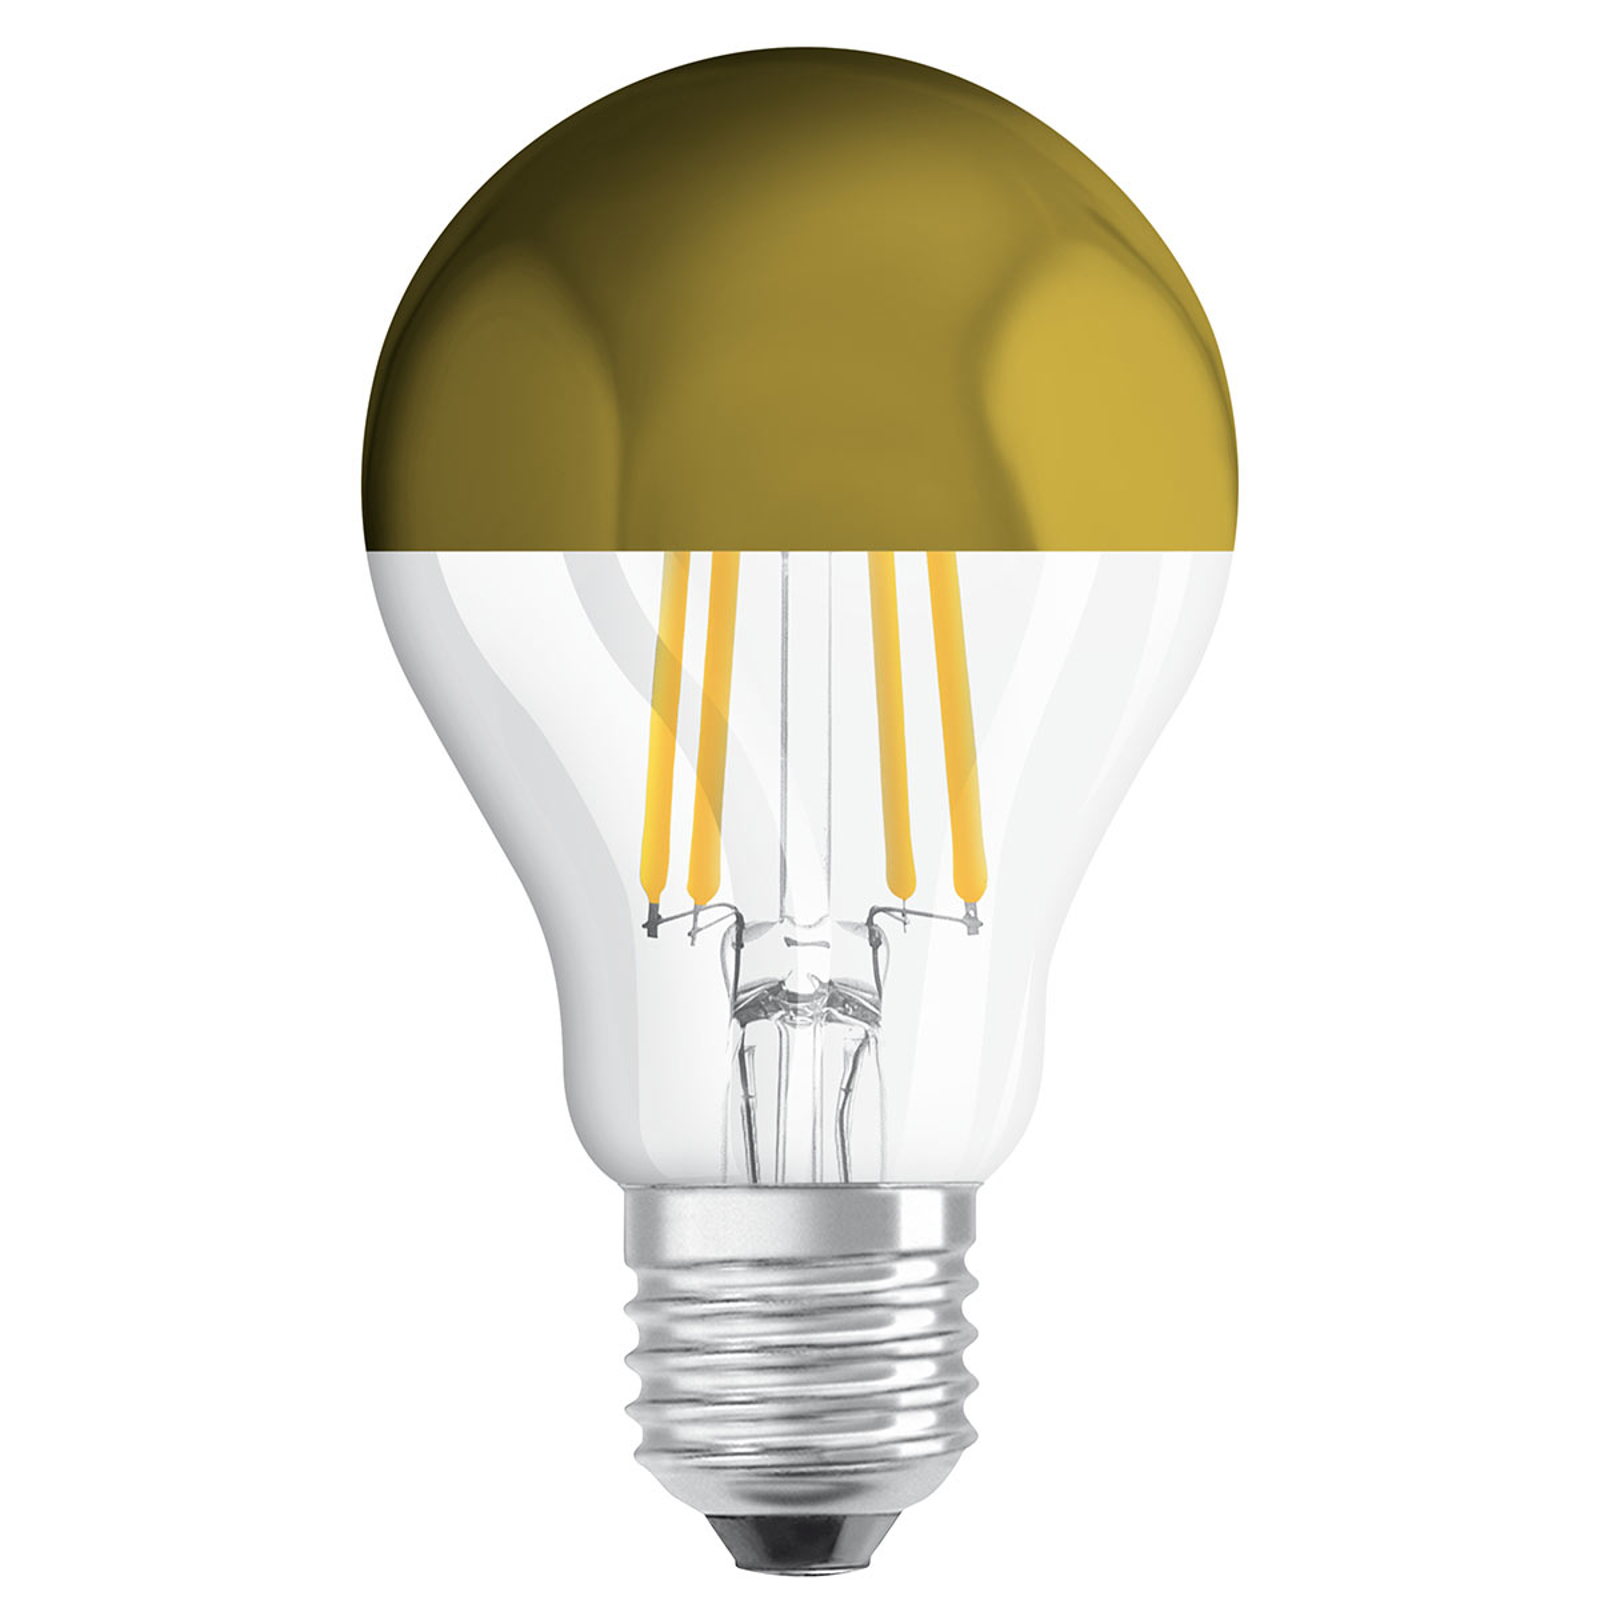 OSRAM-LED-lamppu E27 CLA Mirror gold 4W 2 700 K